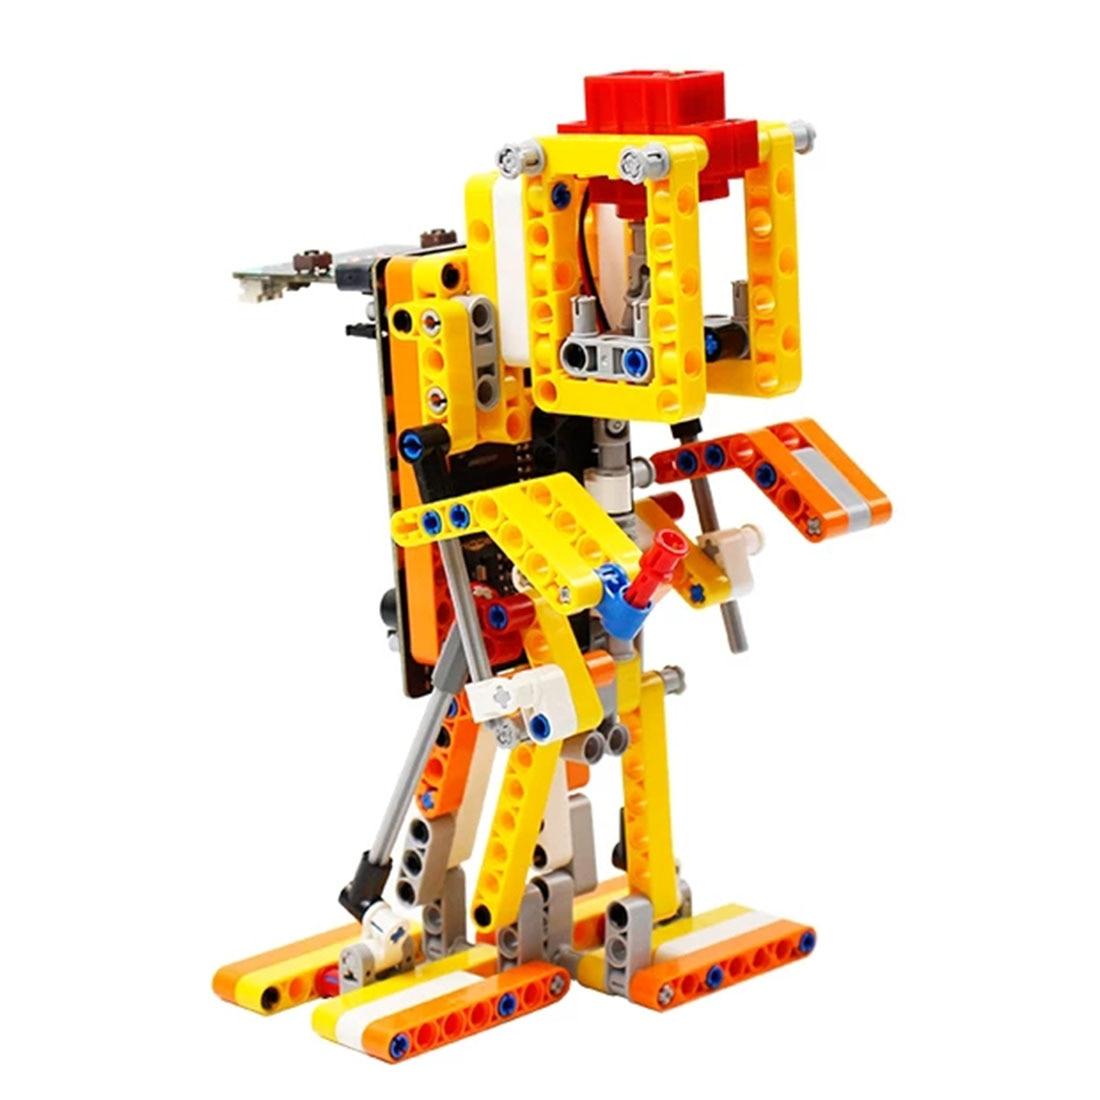 Program Intelligent Walking Robot Kit Steam Programming Education Robot For Micro:Bit(Including/Not Including Micro:Bit Board)